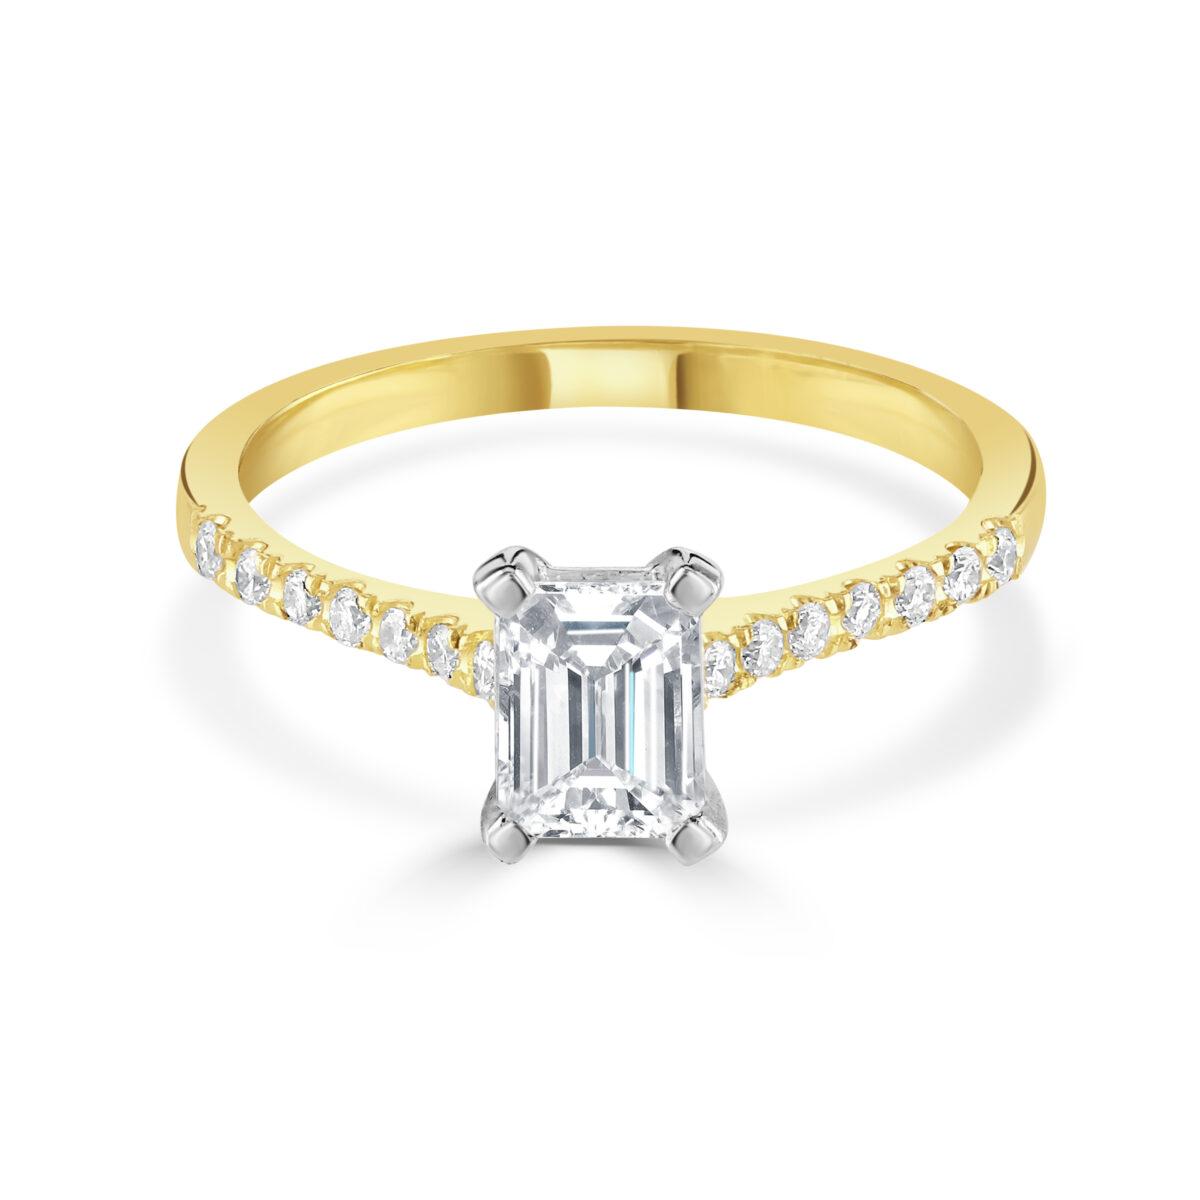 Emerald Cut Yellow Gold Diamond Ring